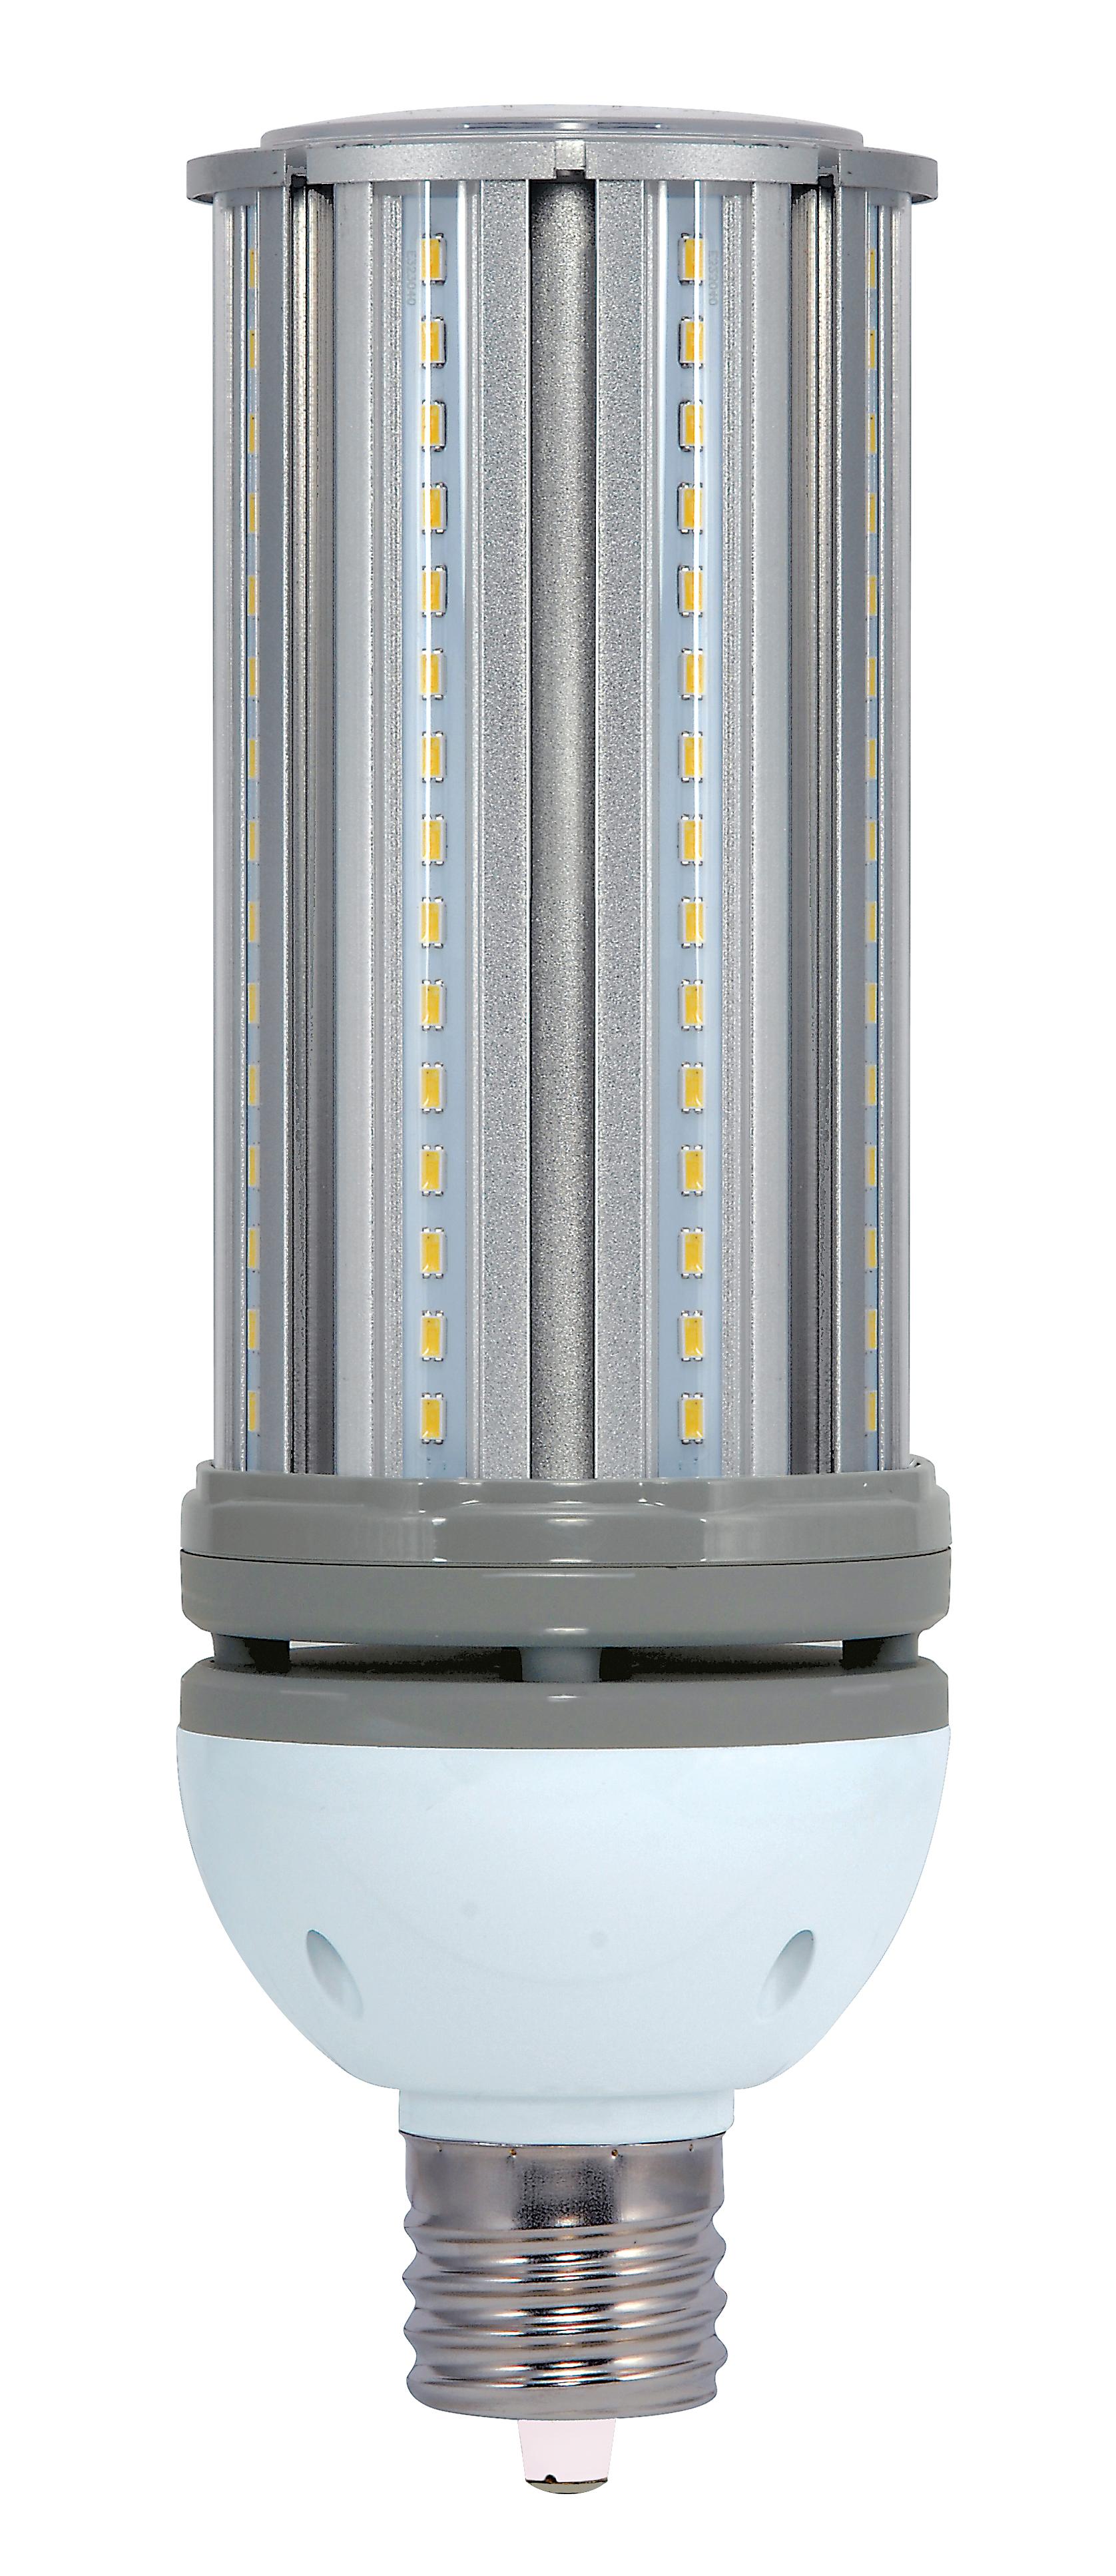 Satco,S9393,SATCO® Hi-Pro Non-Dimmable LED Retrofit, LED Lamp, 100 to 277 VAC